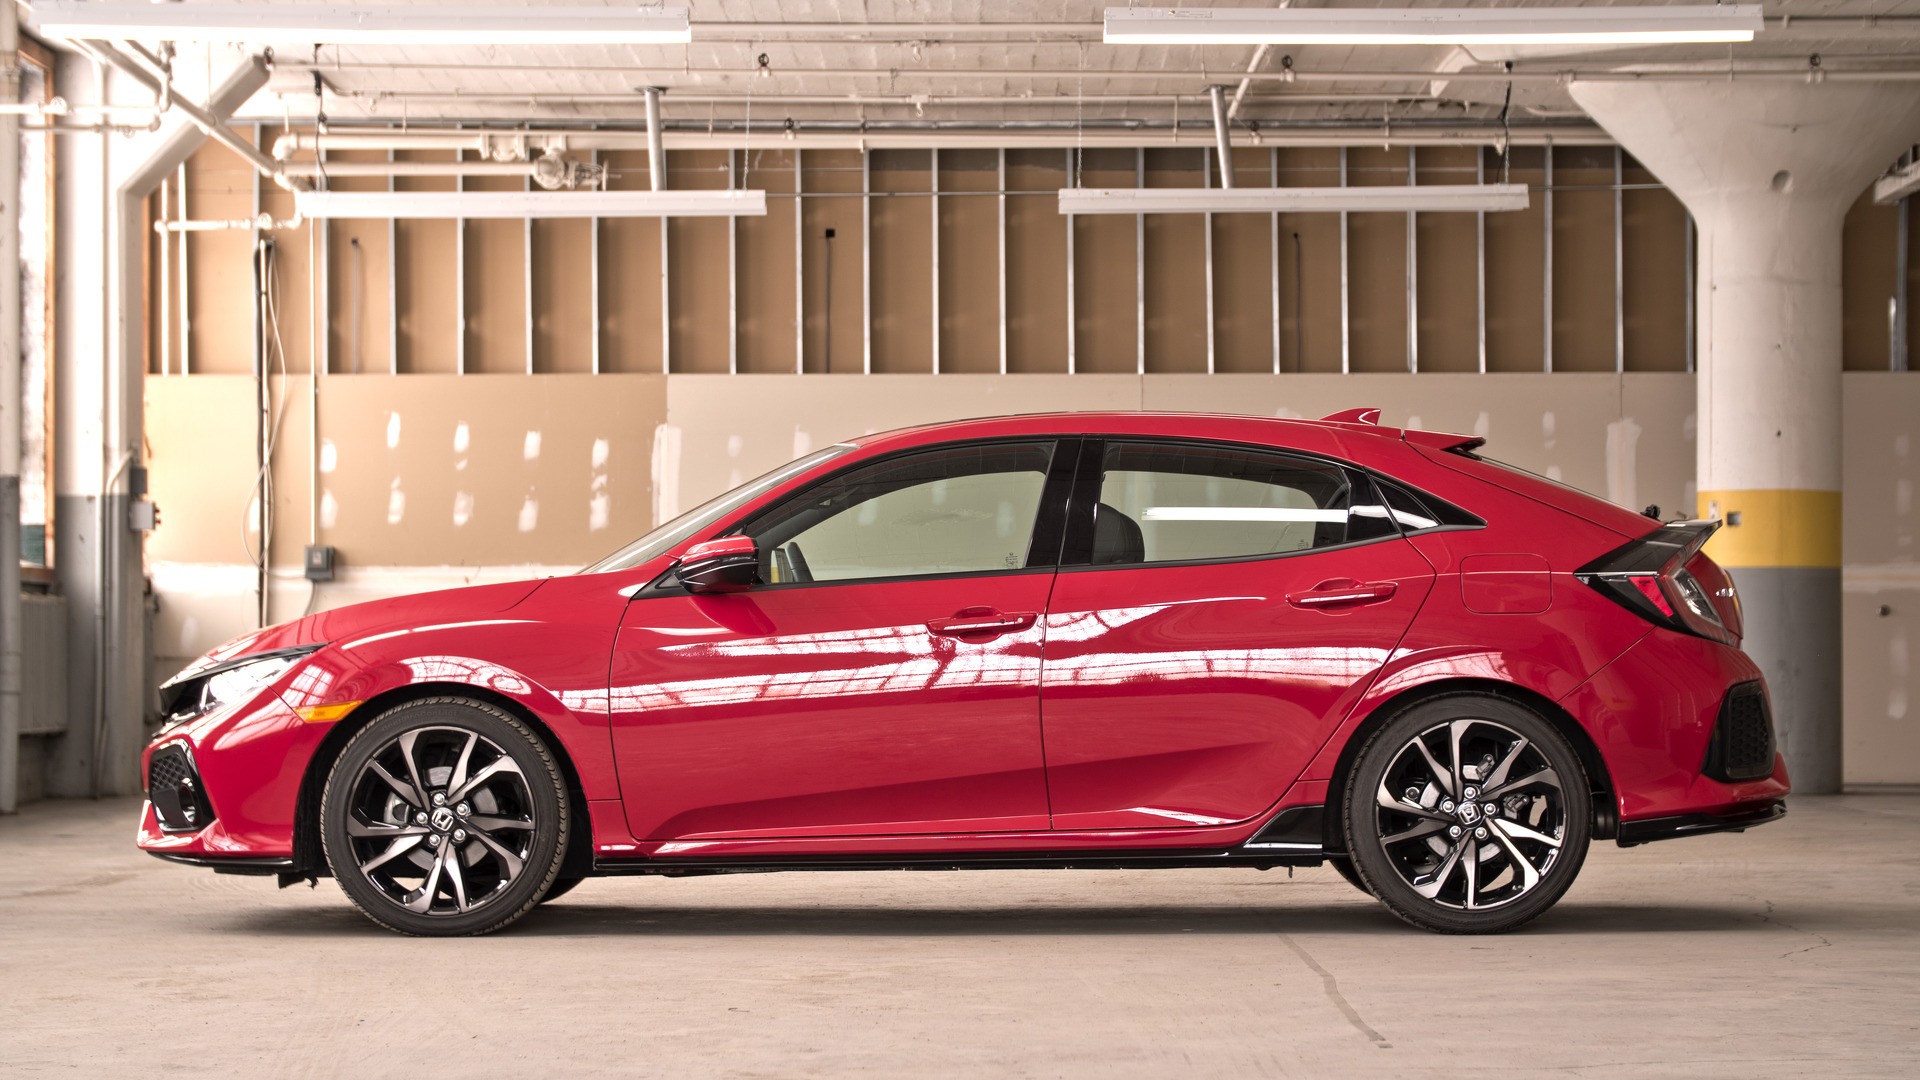 2017 honda civic hatchback why buy for Used 2017 honda civic hatchback